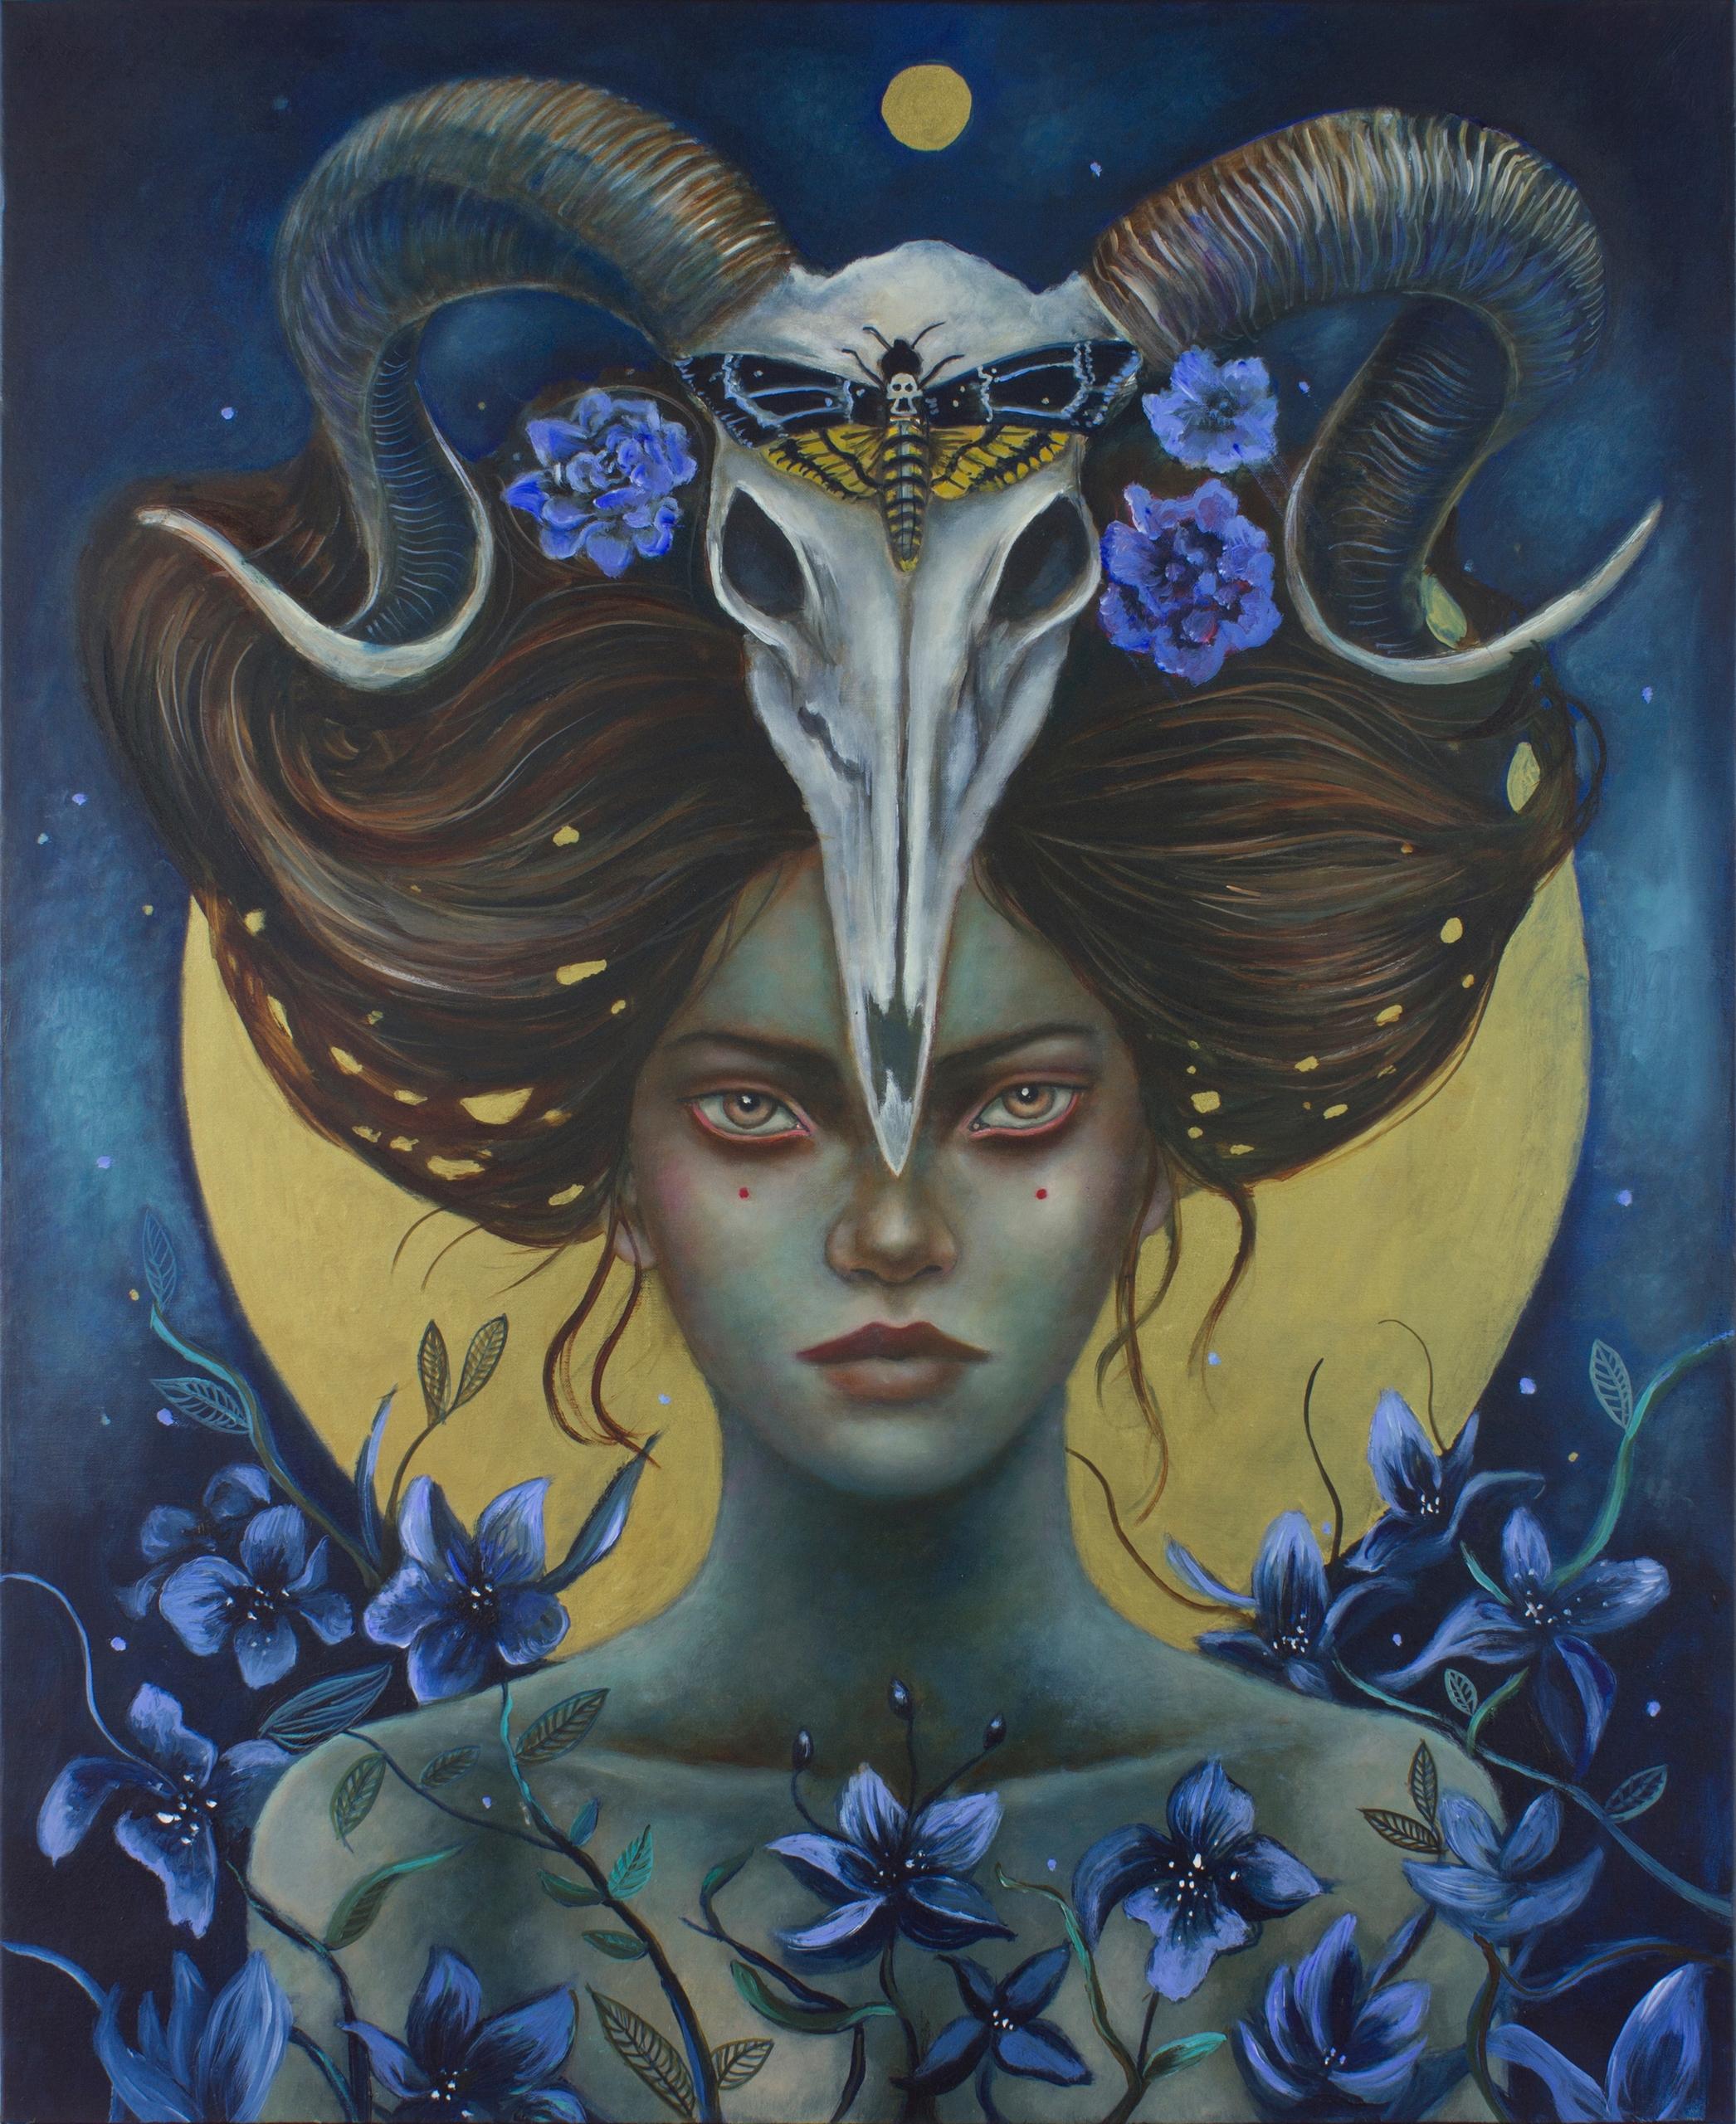 Spell painting 2015 Celestial s - ingridtusell   ello